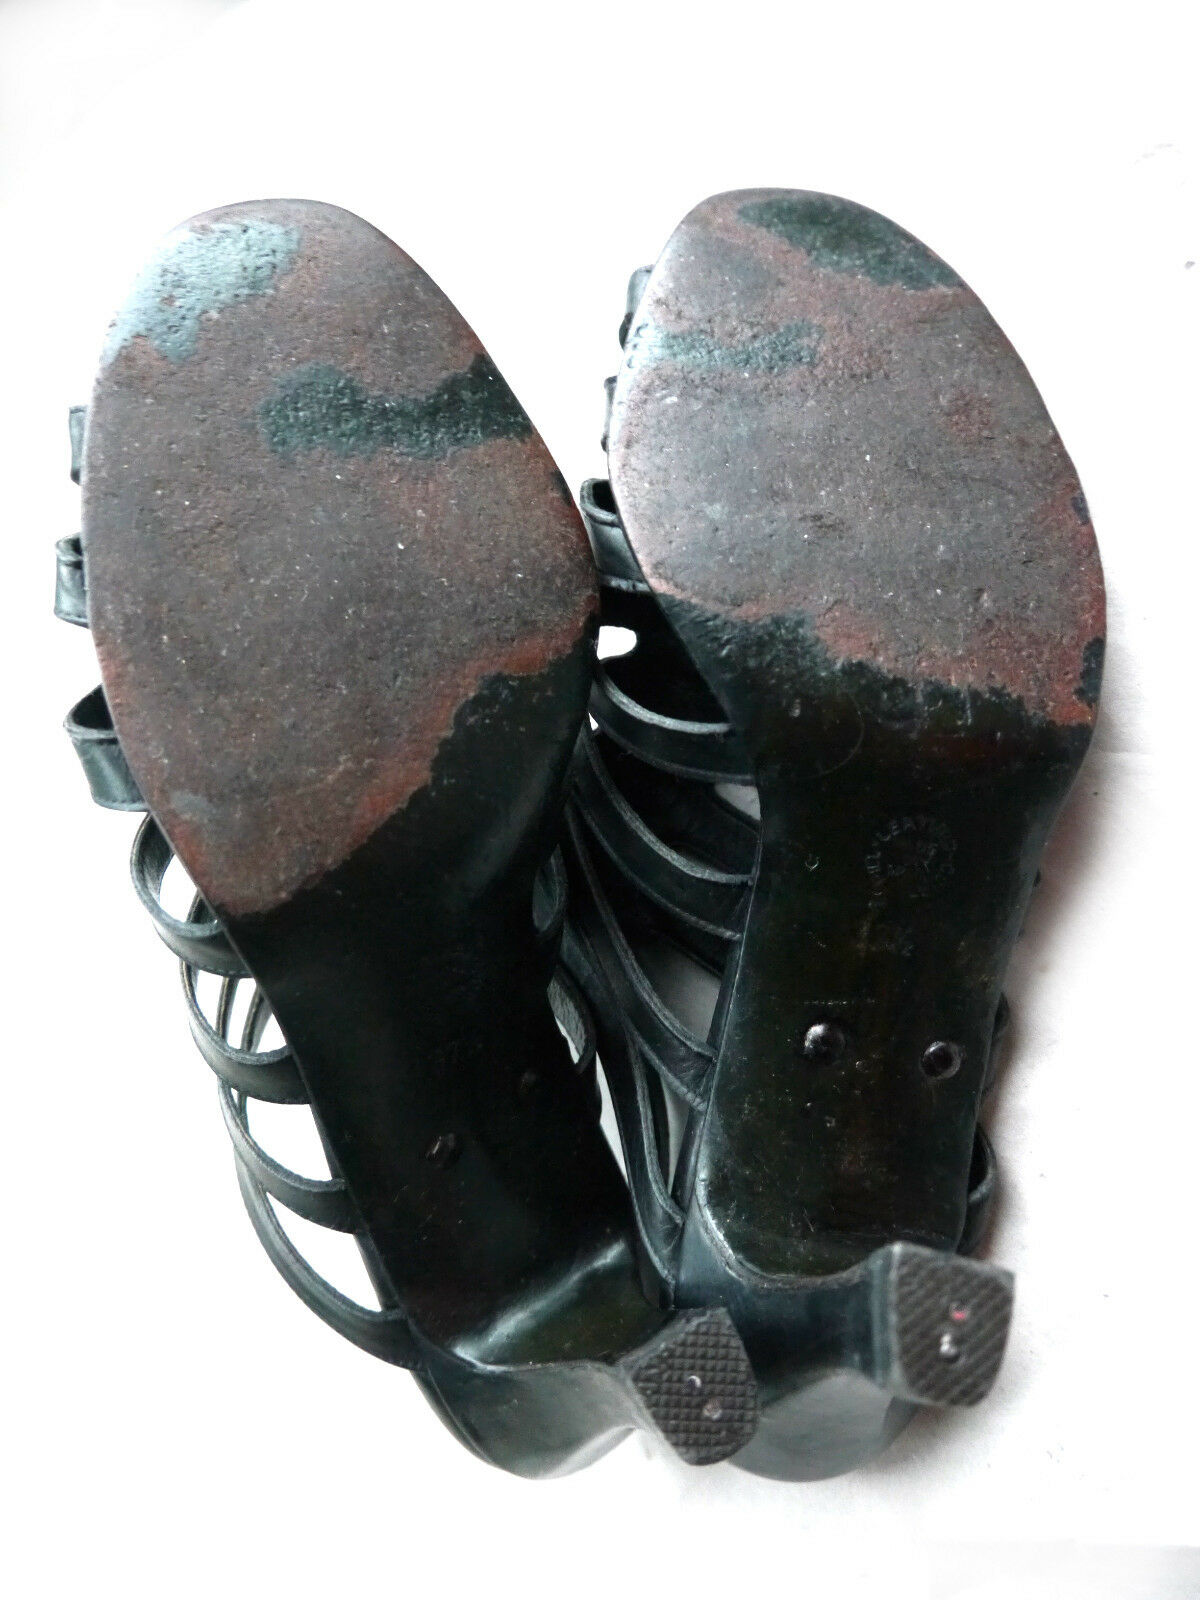 JIL SANDER-Sandaleetten 37,5 Schwarz Leder Römer-Peep-Toes Riemchen-Sandale